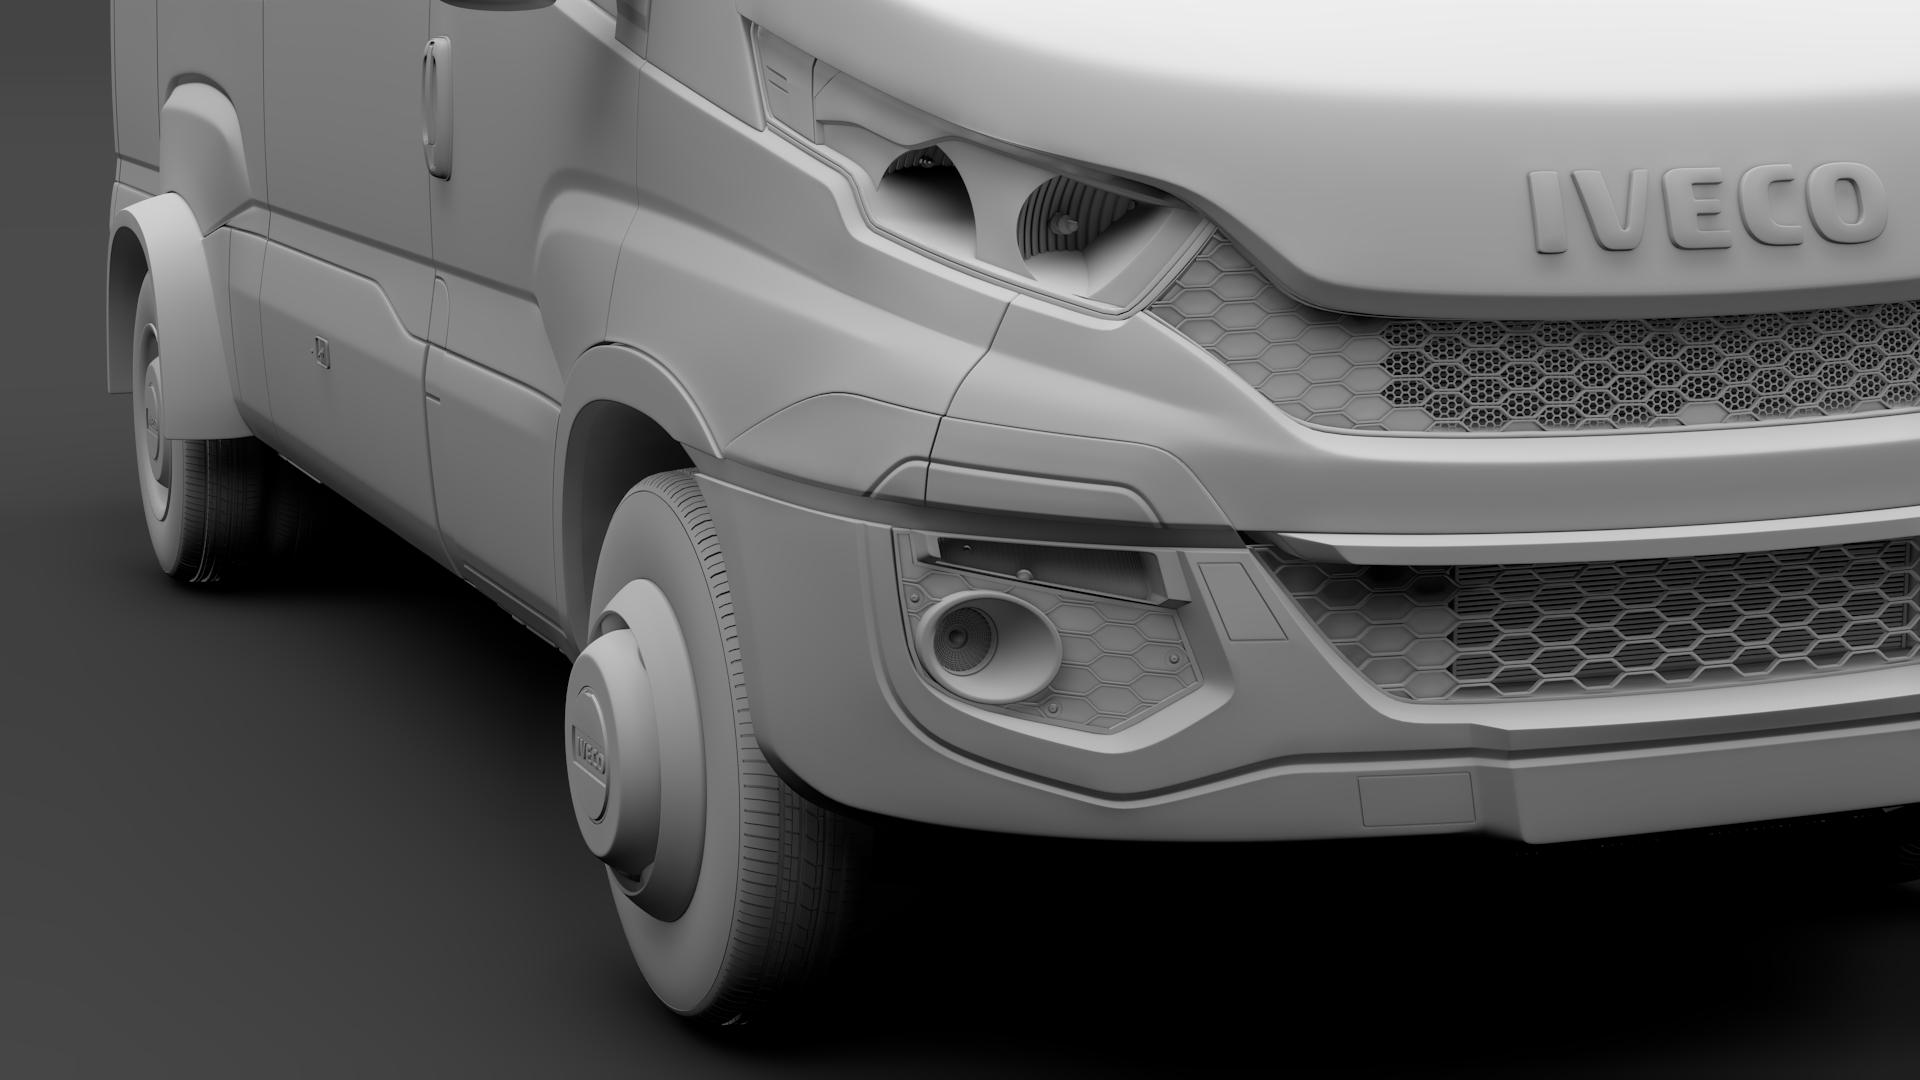 iveco daily minibus l3h2 2014-2016 3d model max fbx c4d lwo ma mb hrc xsi obj 276052